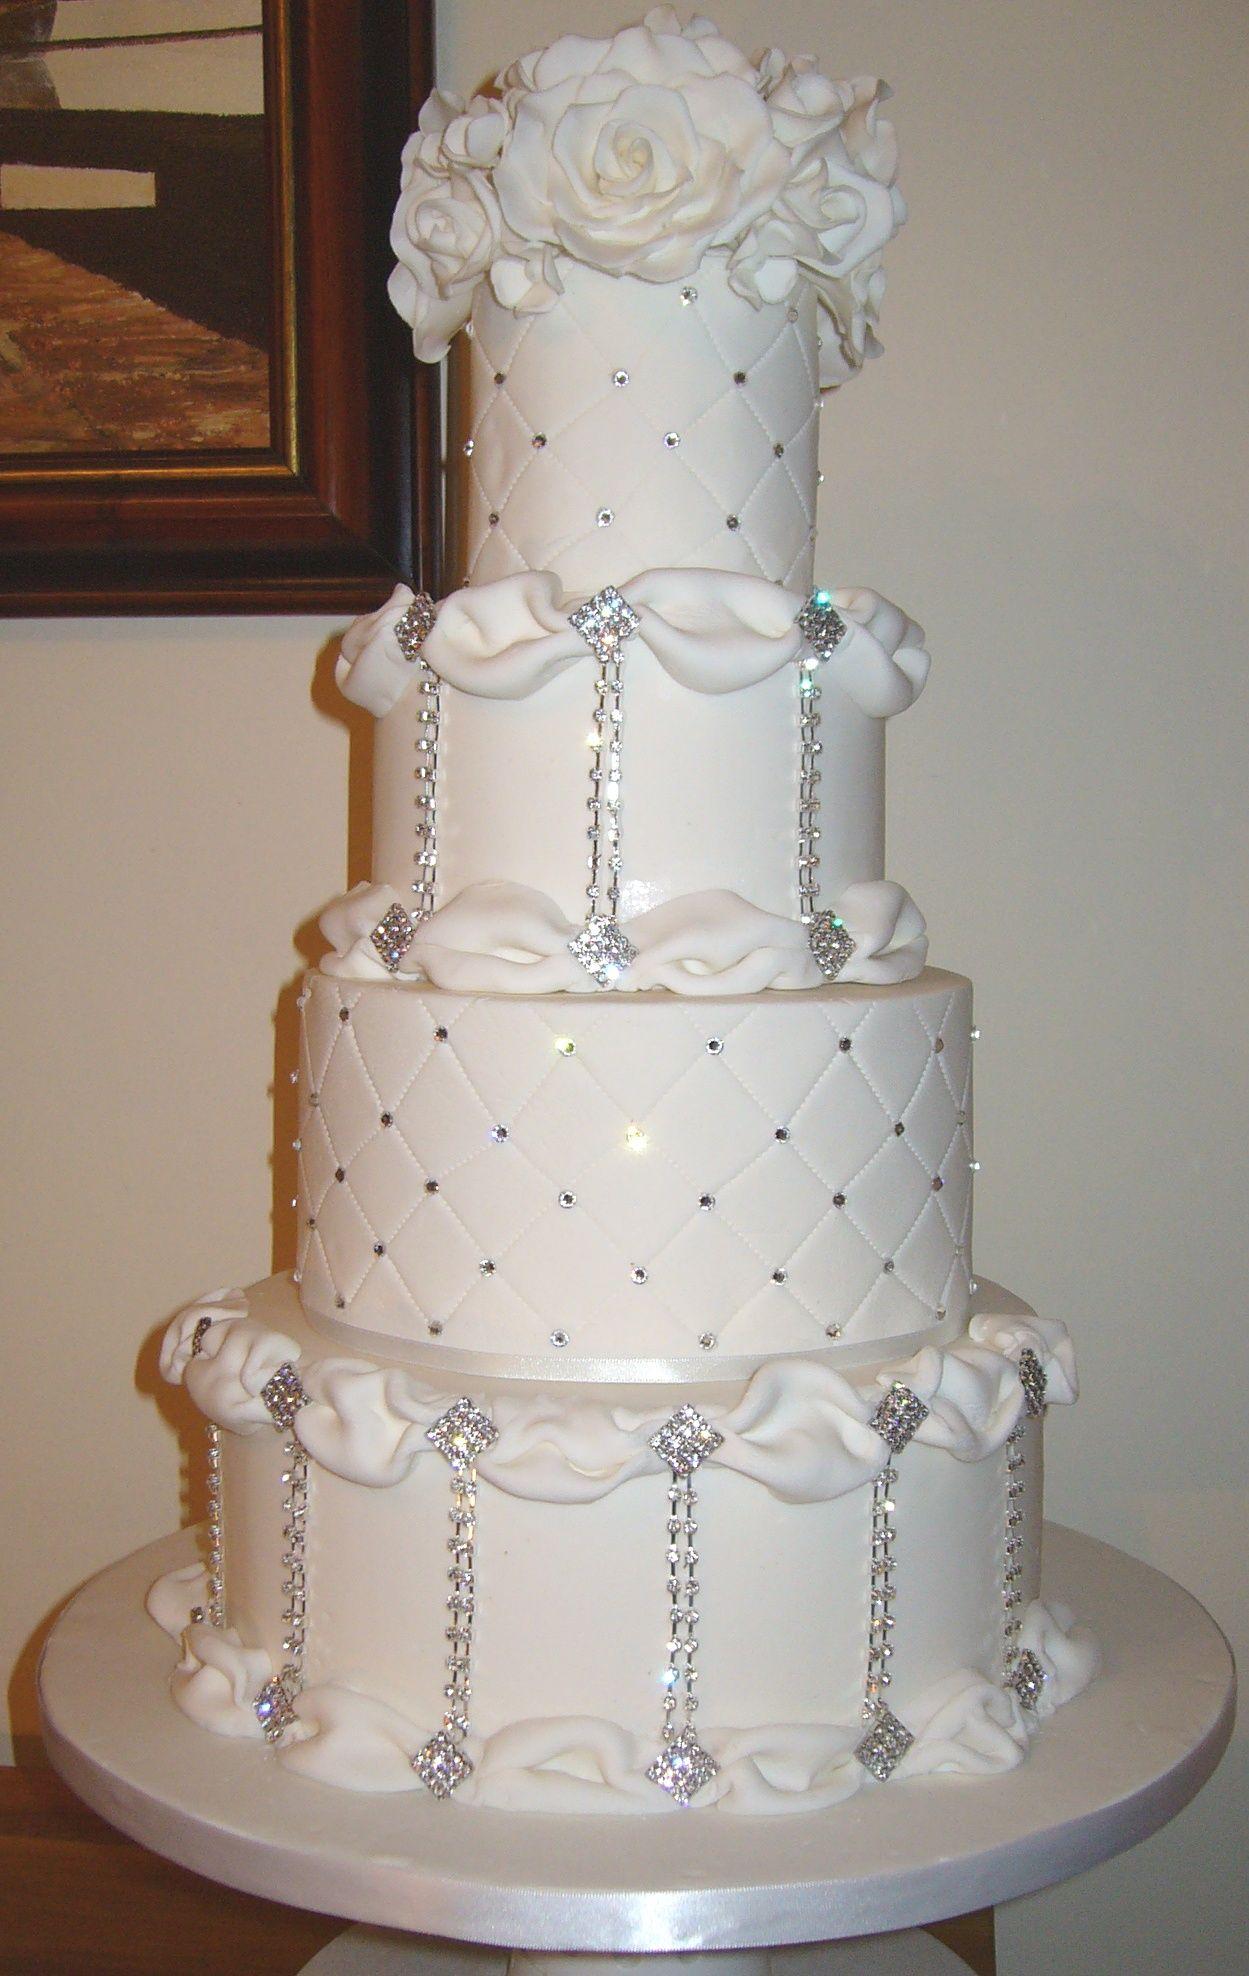 Four tier wedding cake with diamante and Swarovski